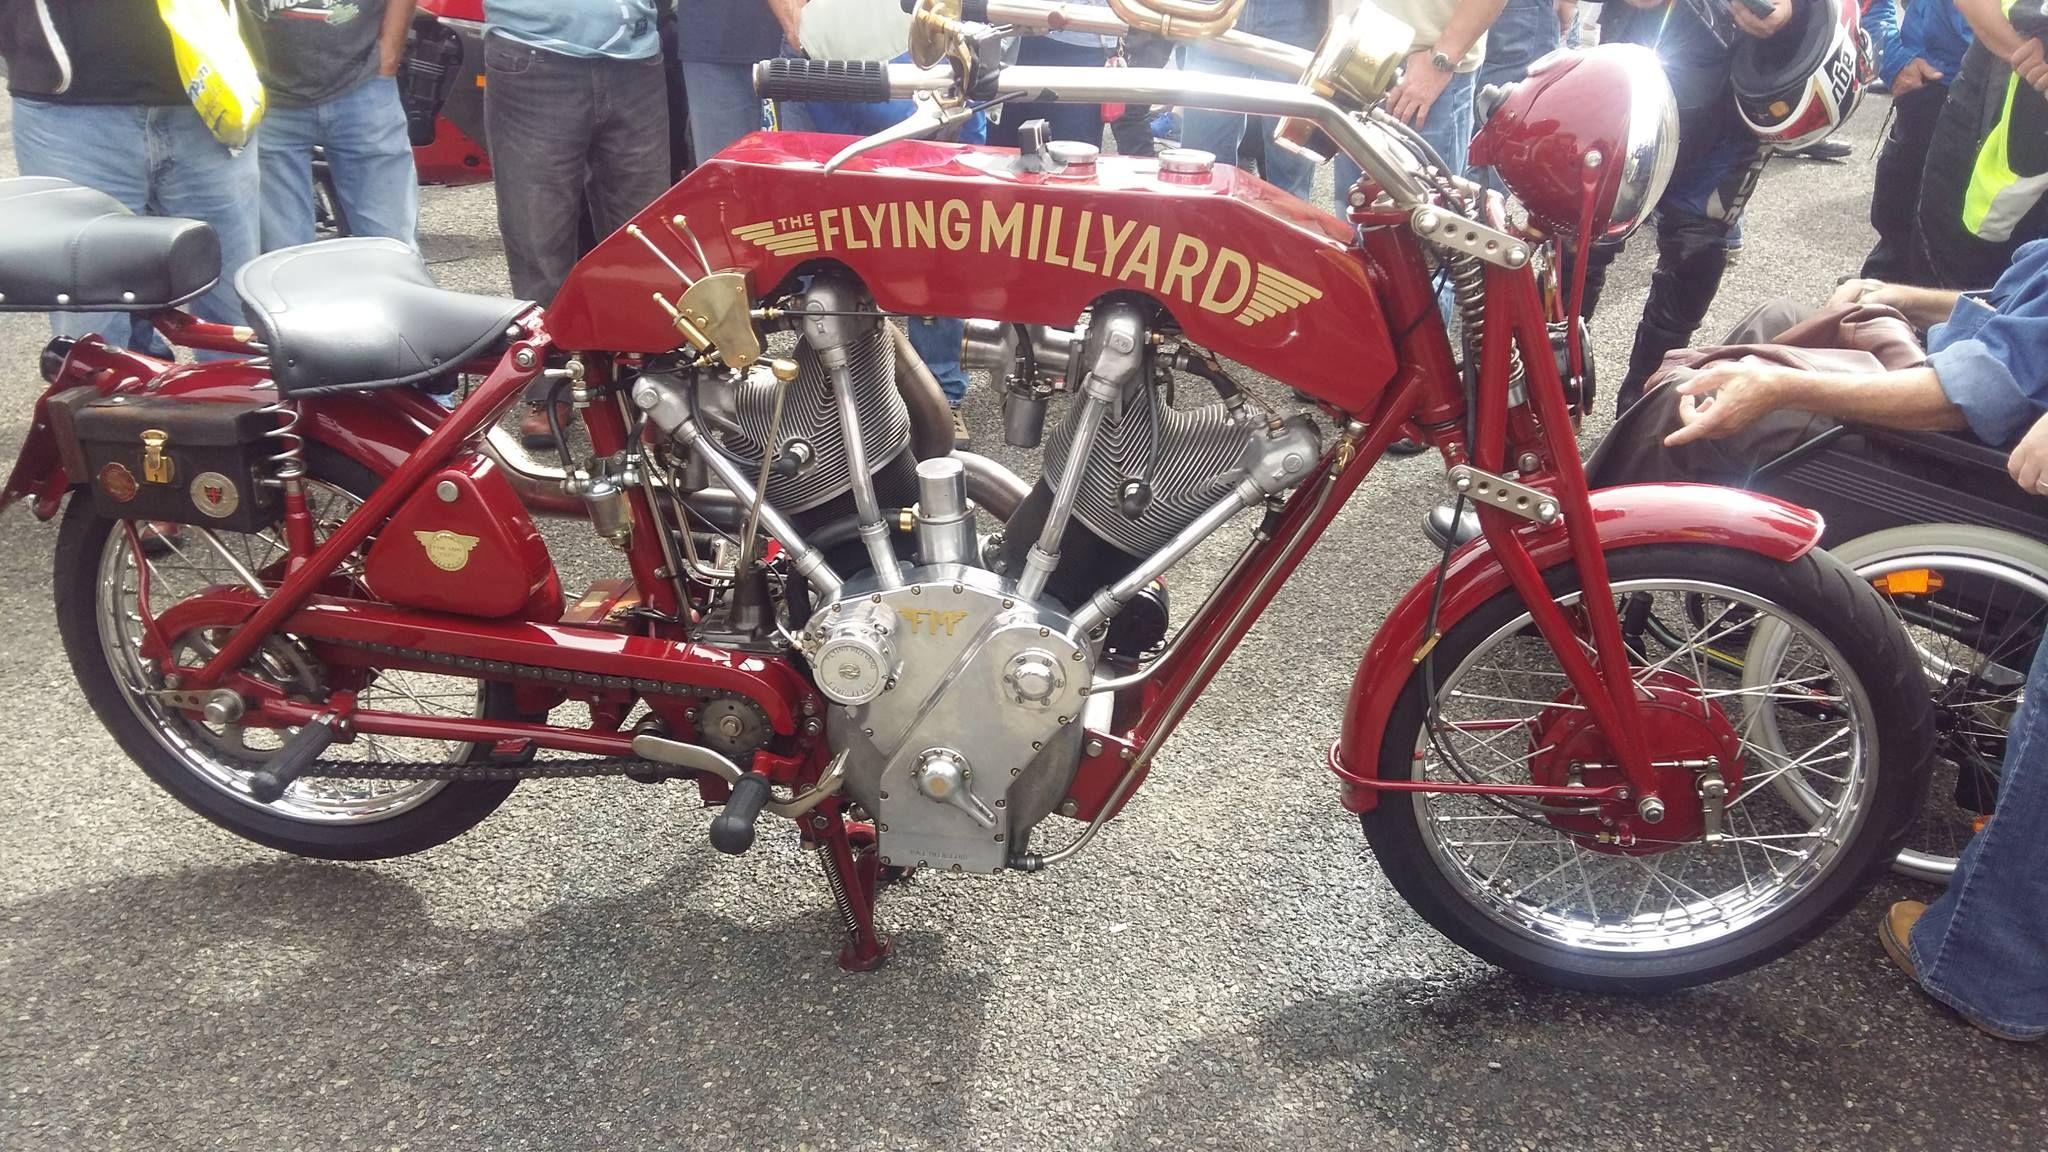 Http Thekneeslider Com The Flying Millyard V Twin Cool Bikes Rat Bike Vintage Bikes